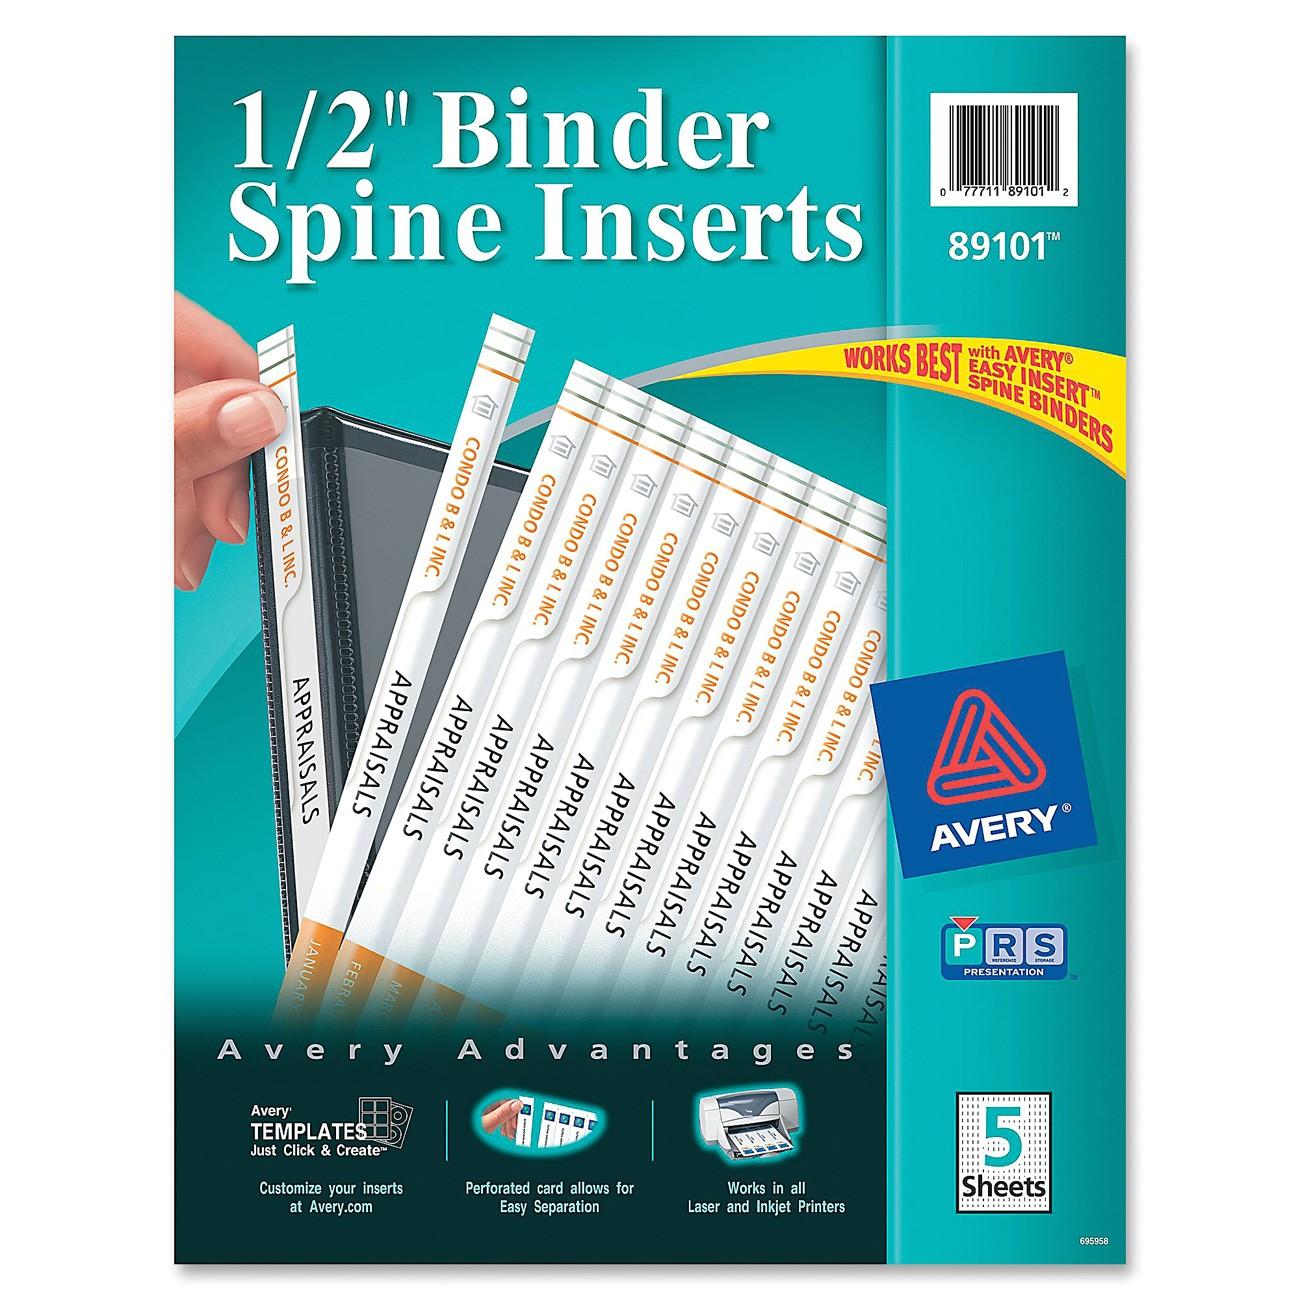 ave89101 avery 89101 binder spine insert